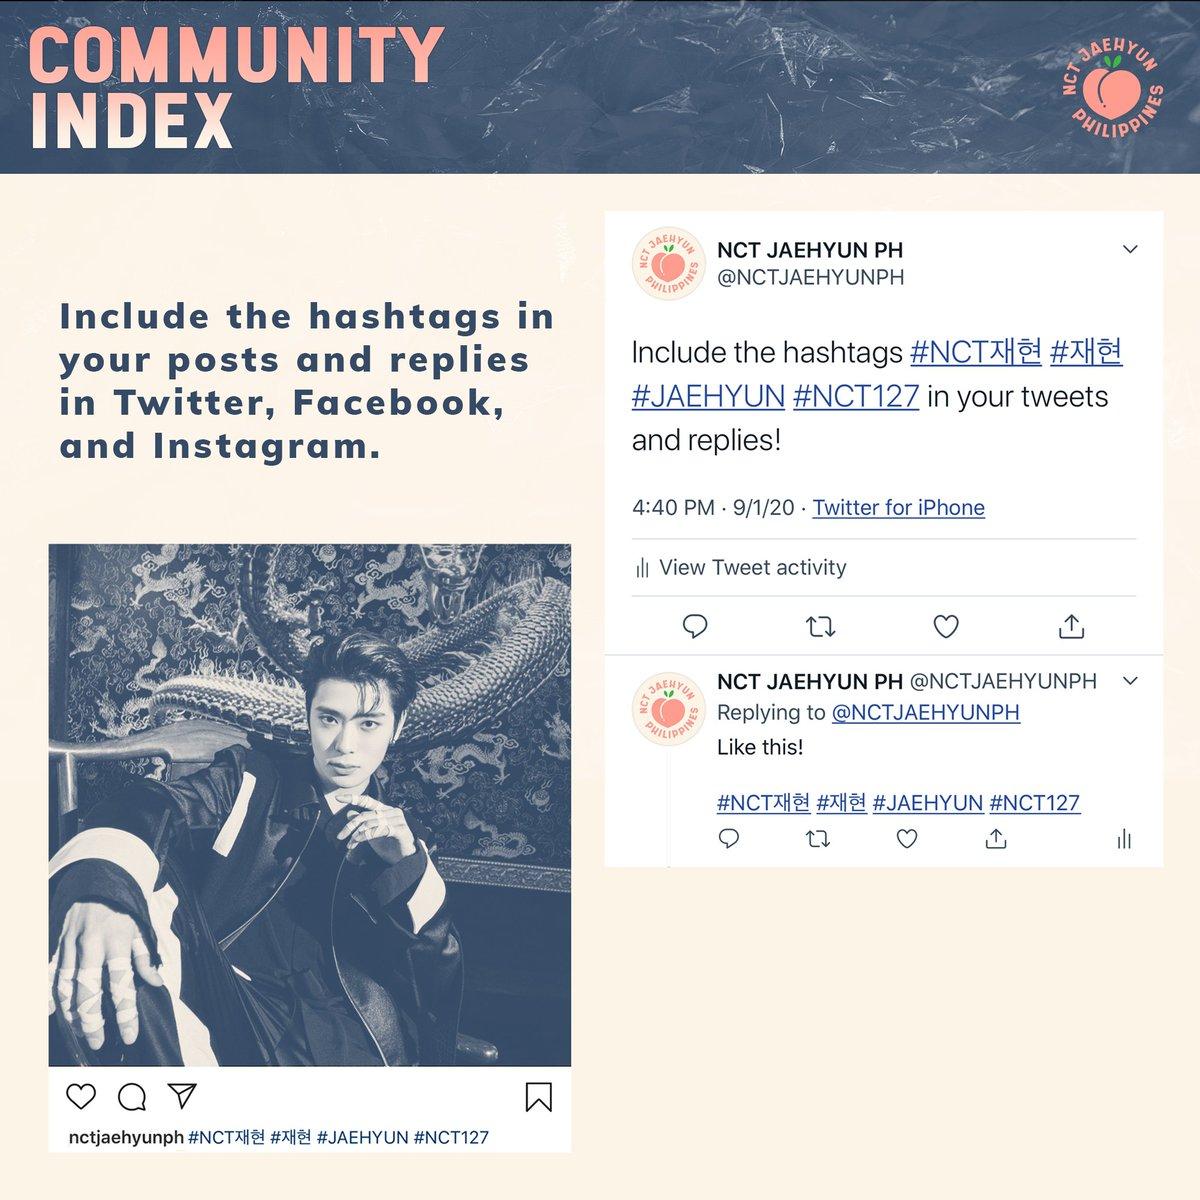 IV. INDEKS KOMUNITAS  Indeks ini mencakup engagement di beberapa SNS platform seperti Twitter, Facebook dan Instagram.  #JaehyunTime #JAEHYUN #NCTJAEHYUN #재현 #NCT재현 @NCTsmtown_127 https://t.co/wjZ87w8KRk